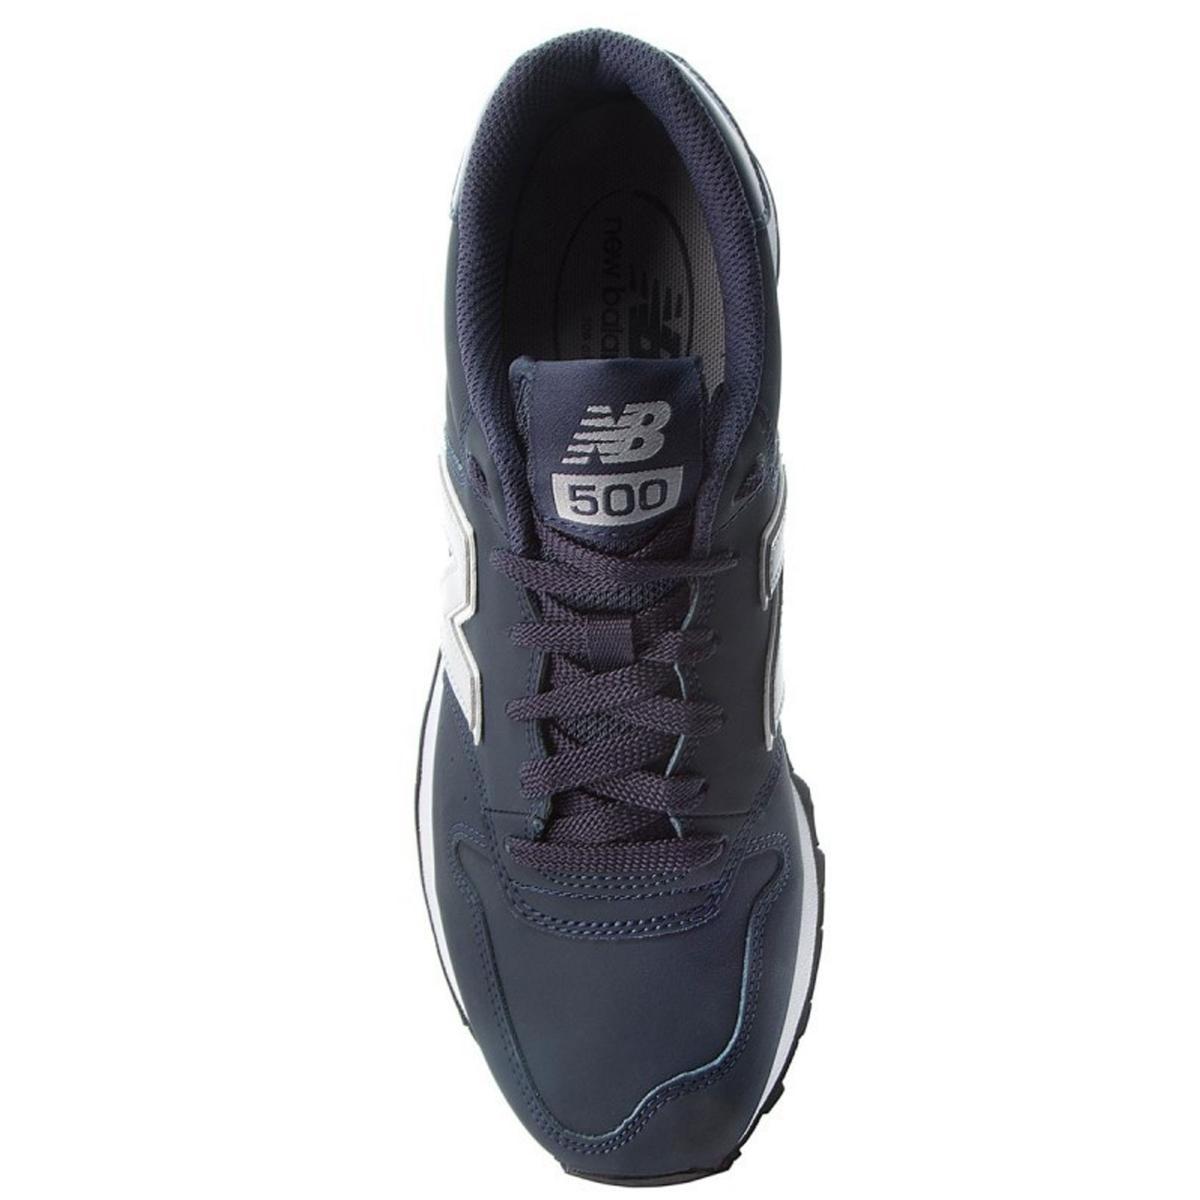 Scarpe Sneakers New Balance da uomo rif. GM500BLG